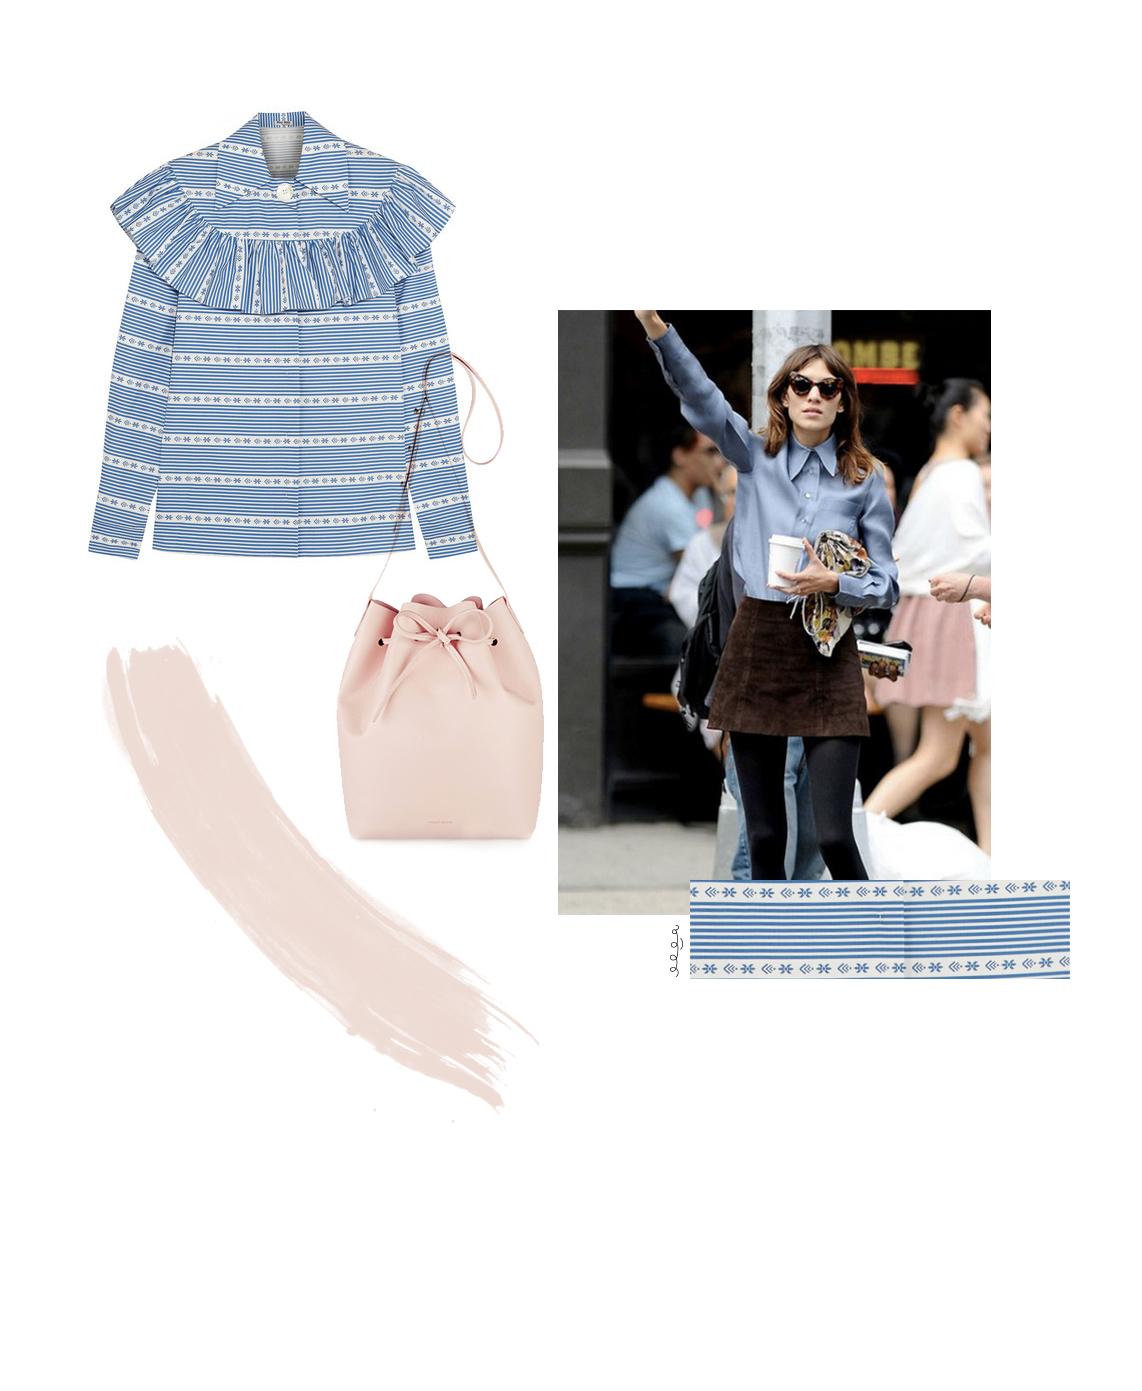 twelve:ofour | miu miu top, mansur gavriel baby pink bucket bag, alexa chung street style